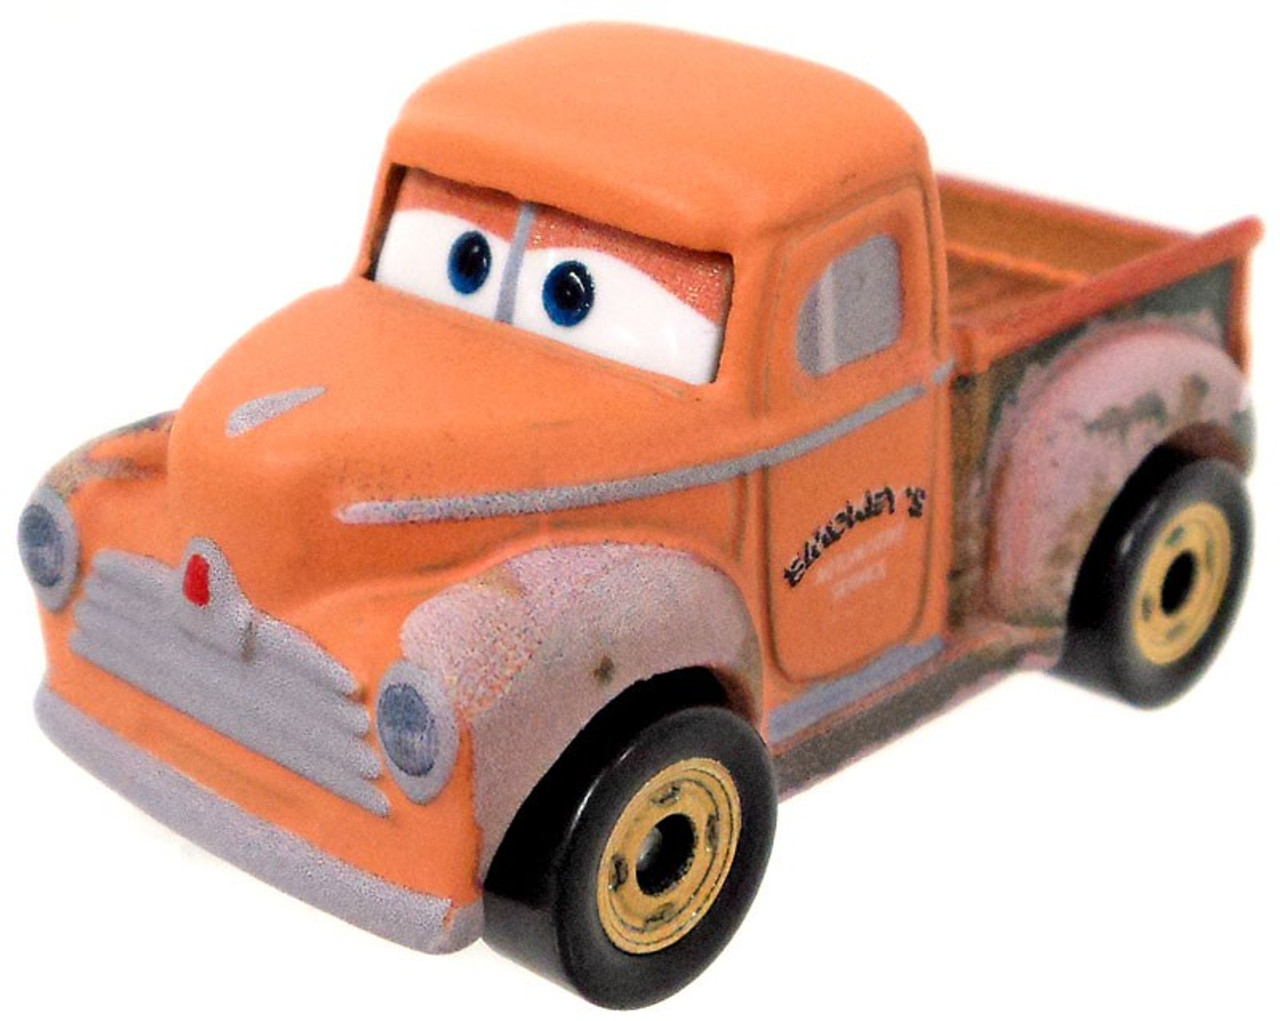 Disney Cars Die Cast Mini Racers Smokey Car Loose Mattel Toys Toywiz